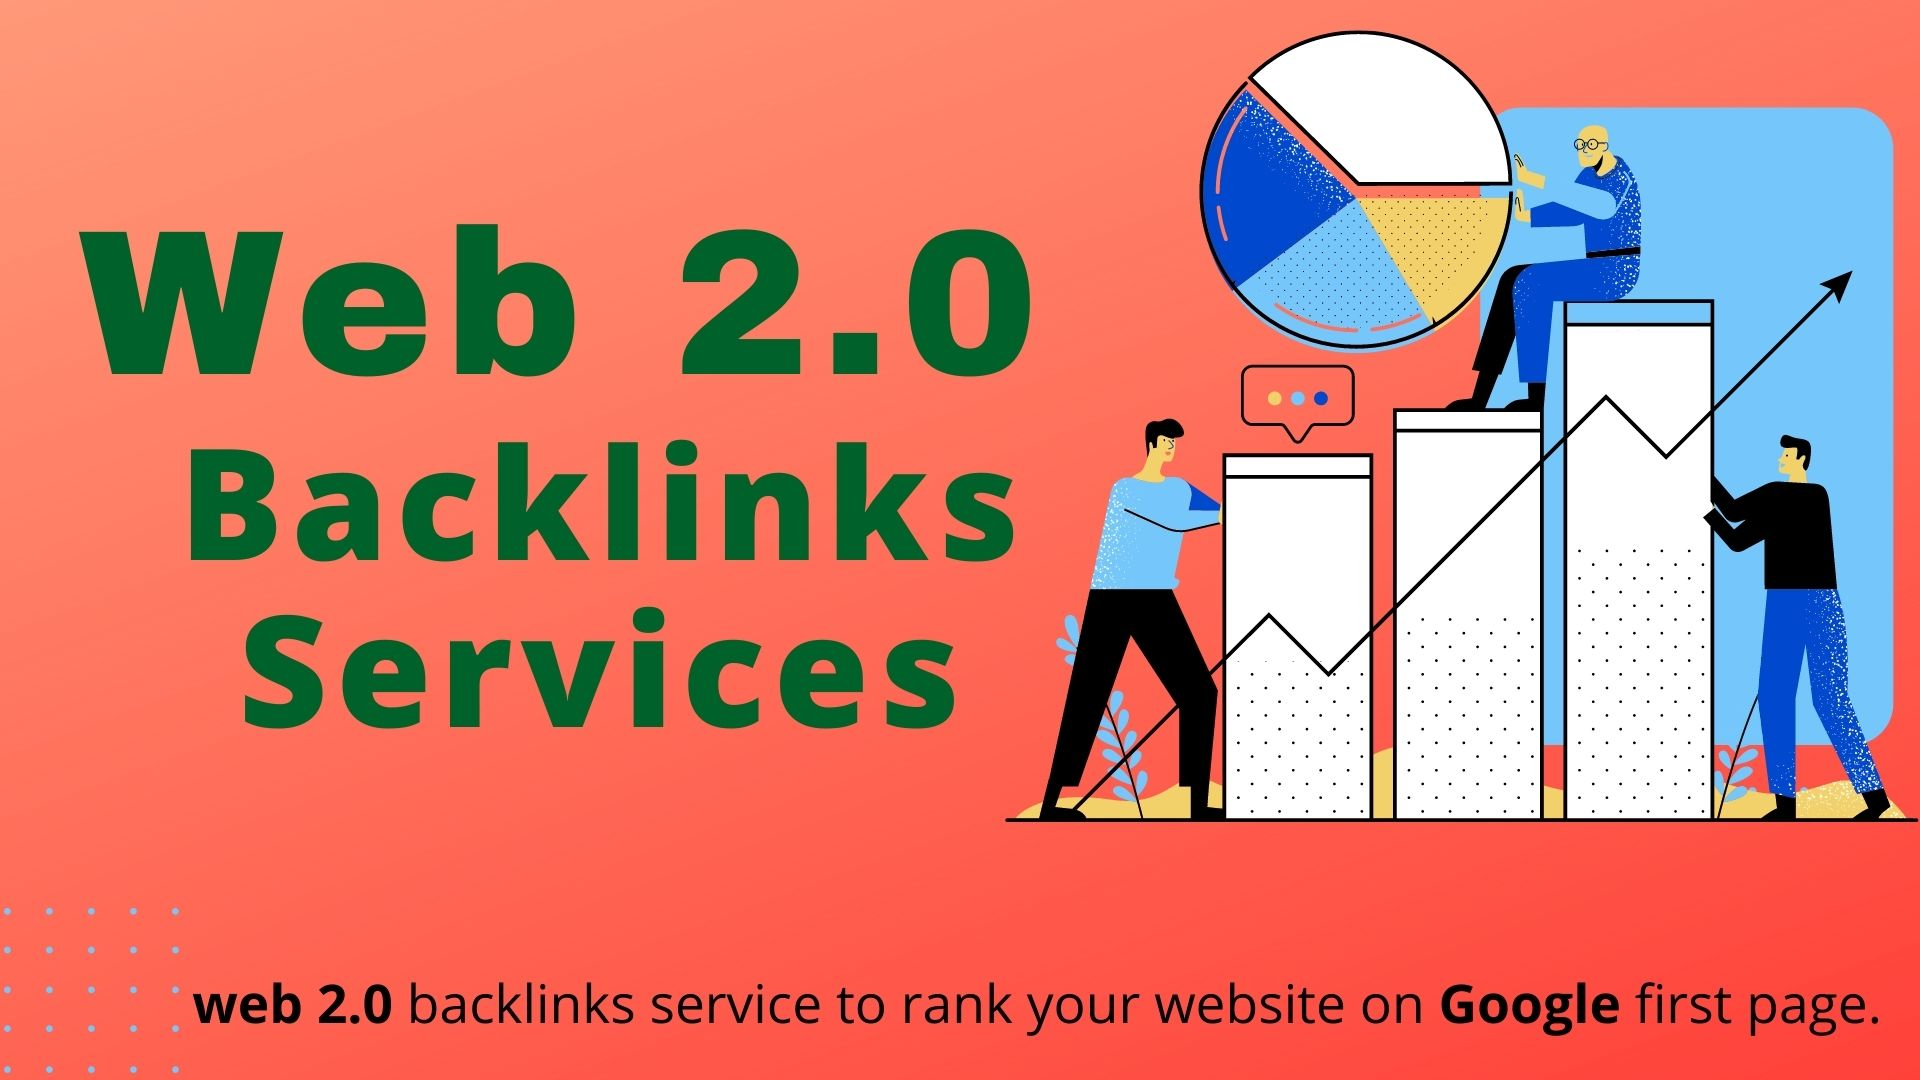 I Will Create 30 High Quality Web 2.0 Backlinks.